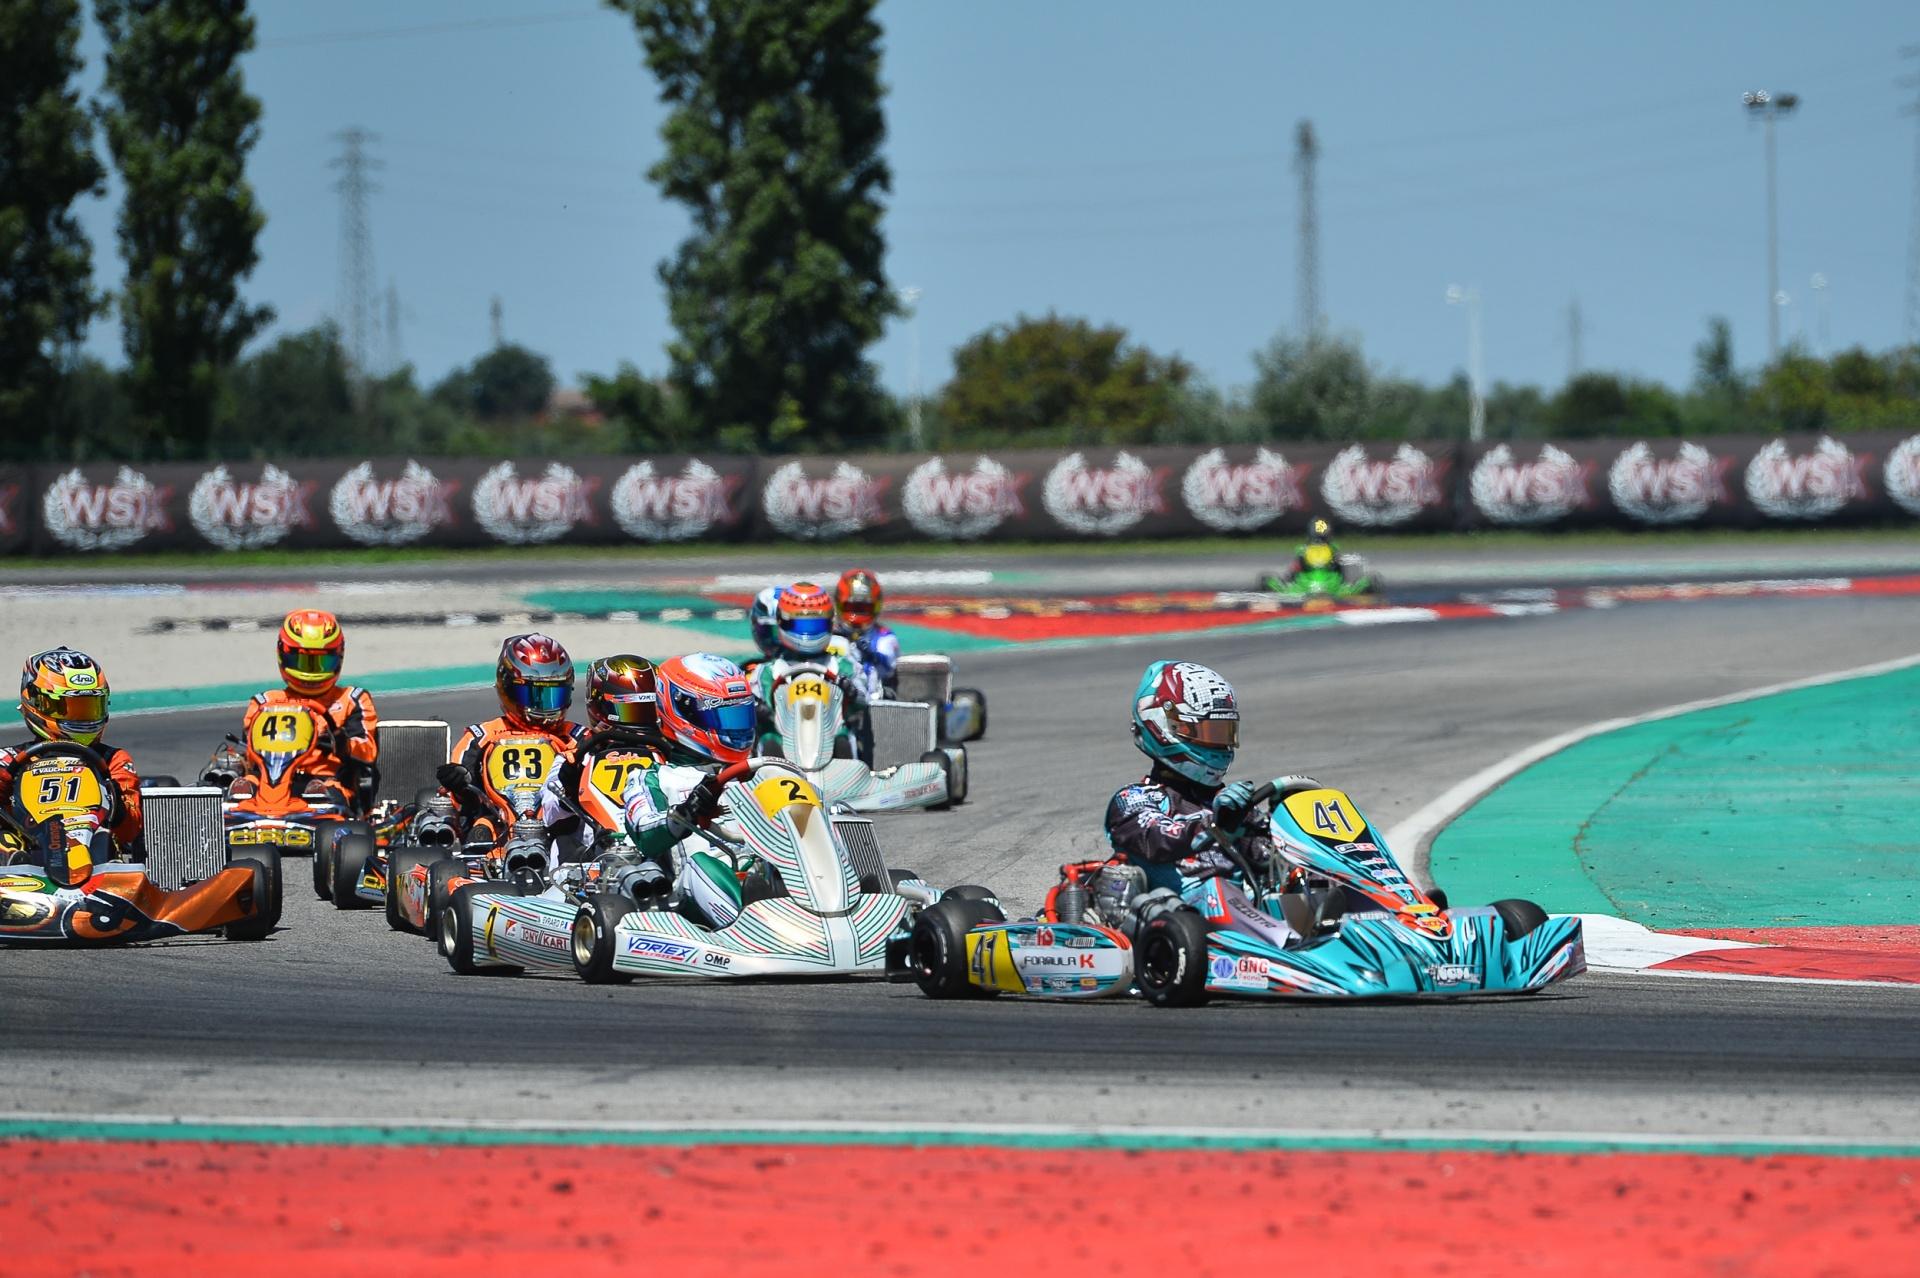 Weekend costruttivo per NGM Motorsport sulla pista di Adria